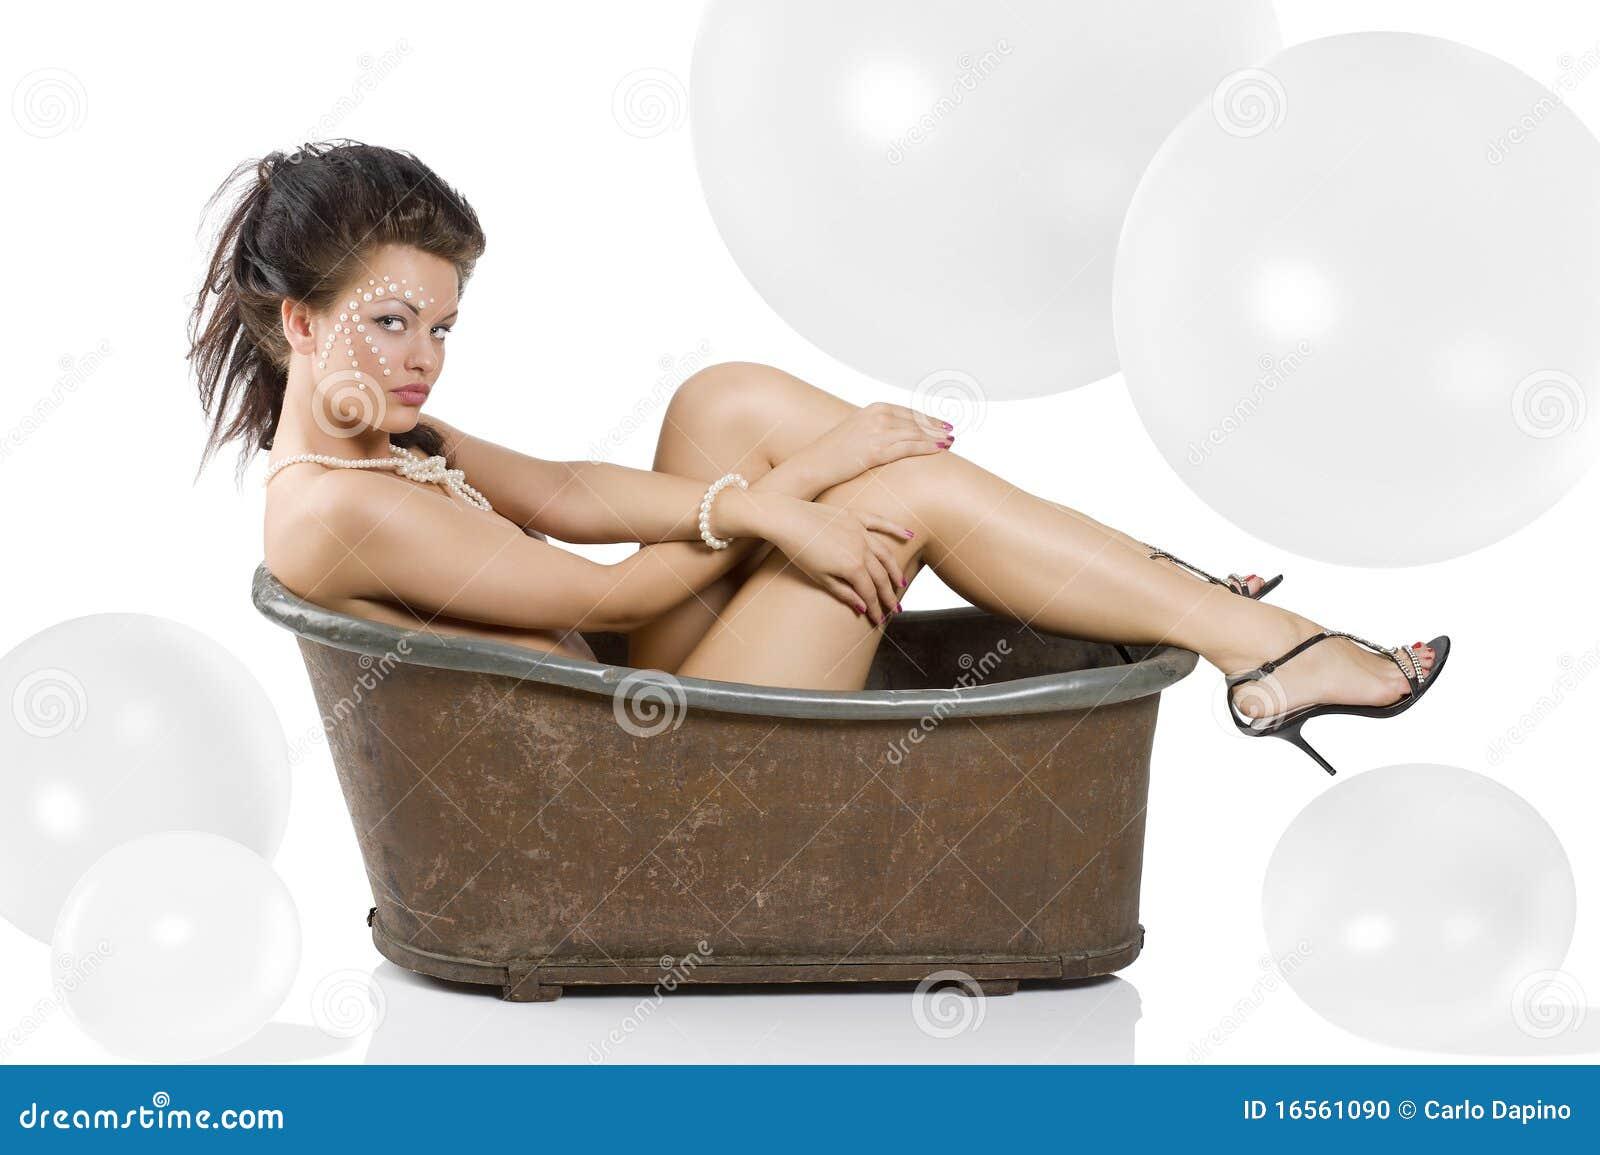 Nude amateur bath claw foot